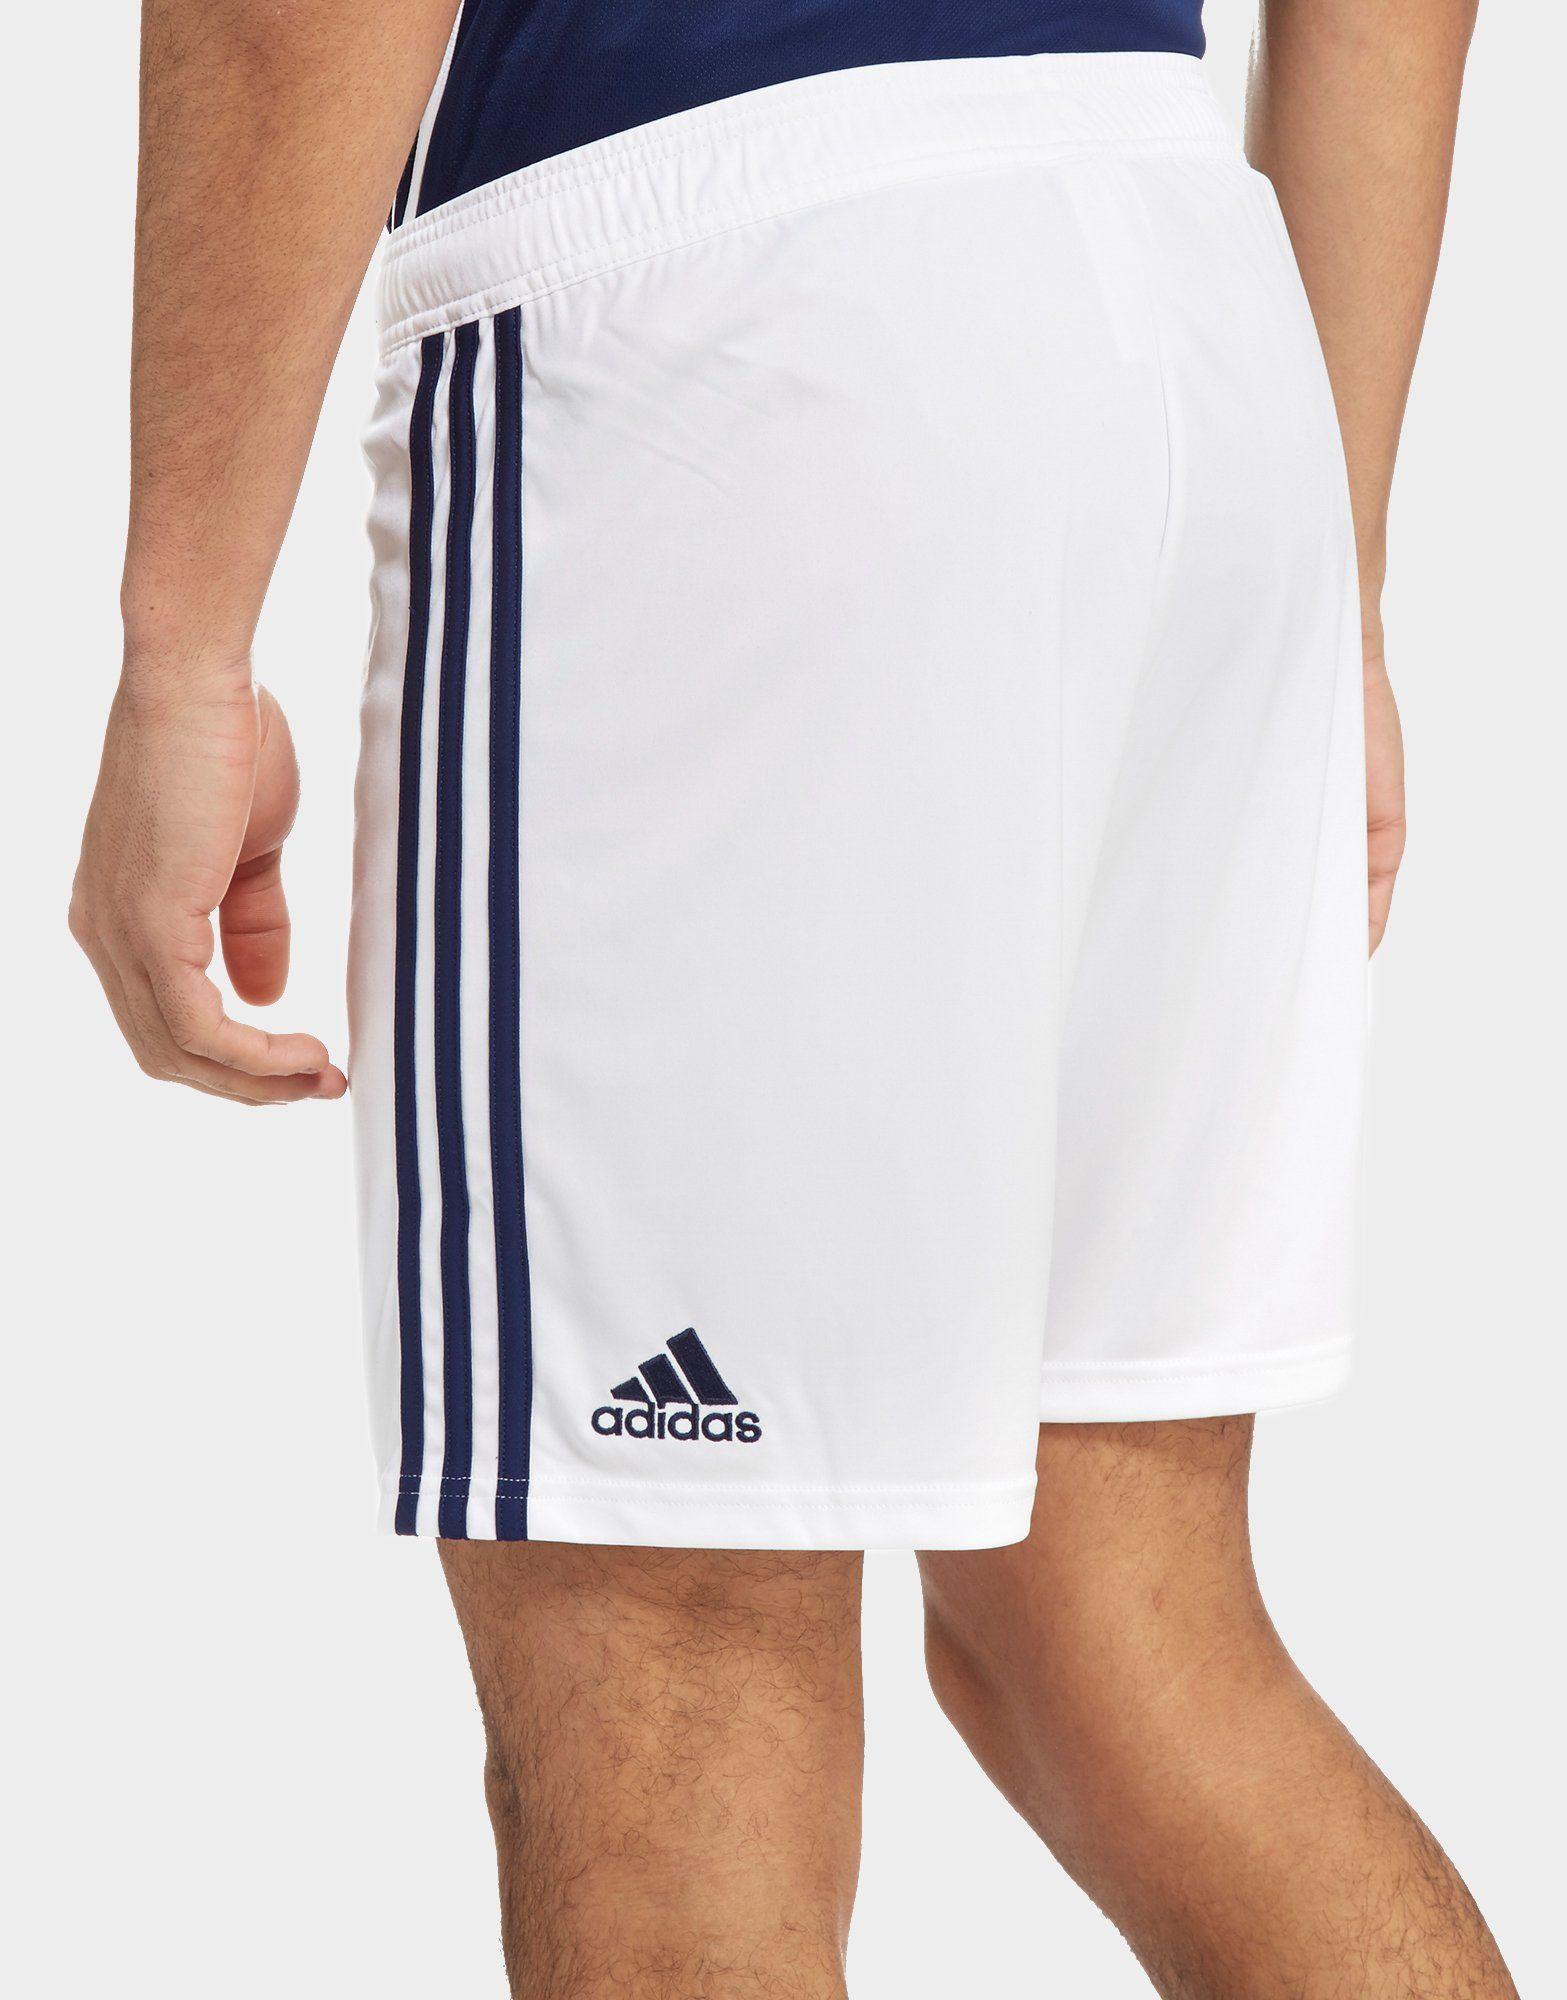 adidas Scotland 2018/19 Home Shorts